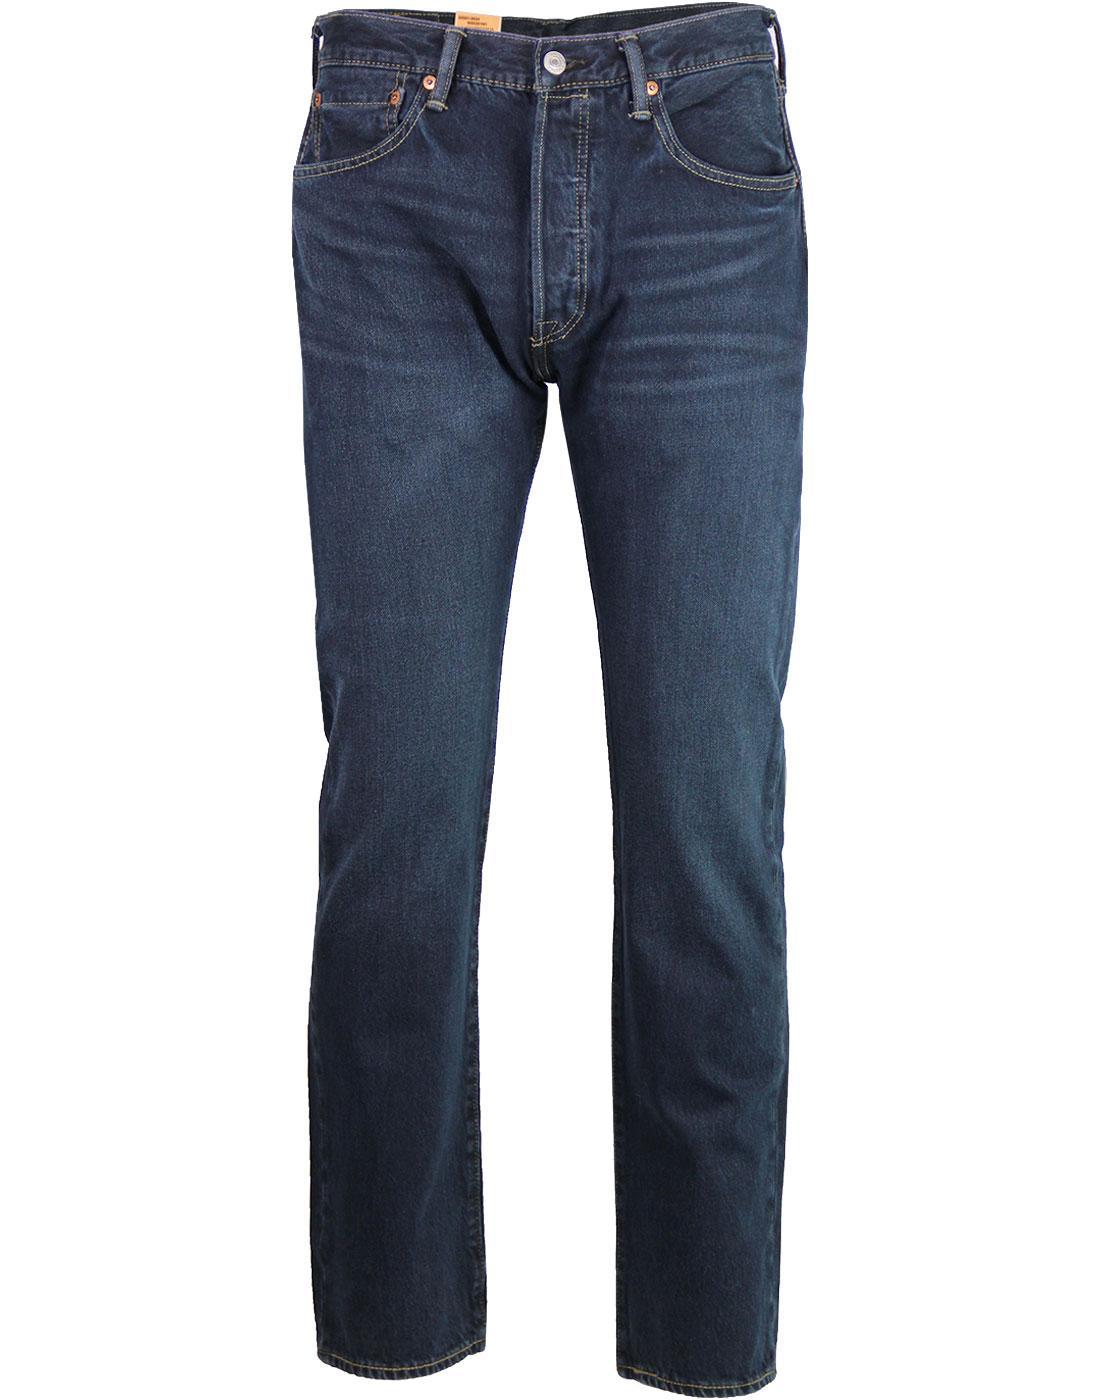 LEVI'S 501 Original Straight Jeans DARK HOURS